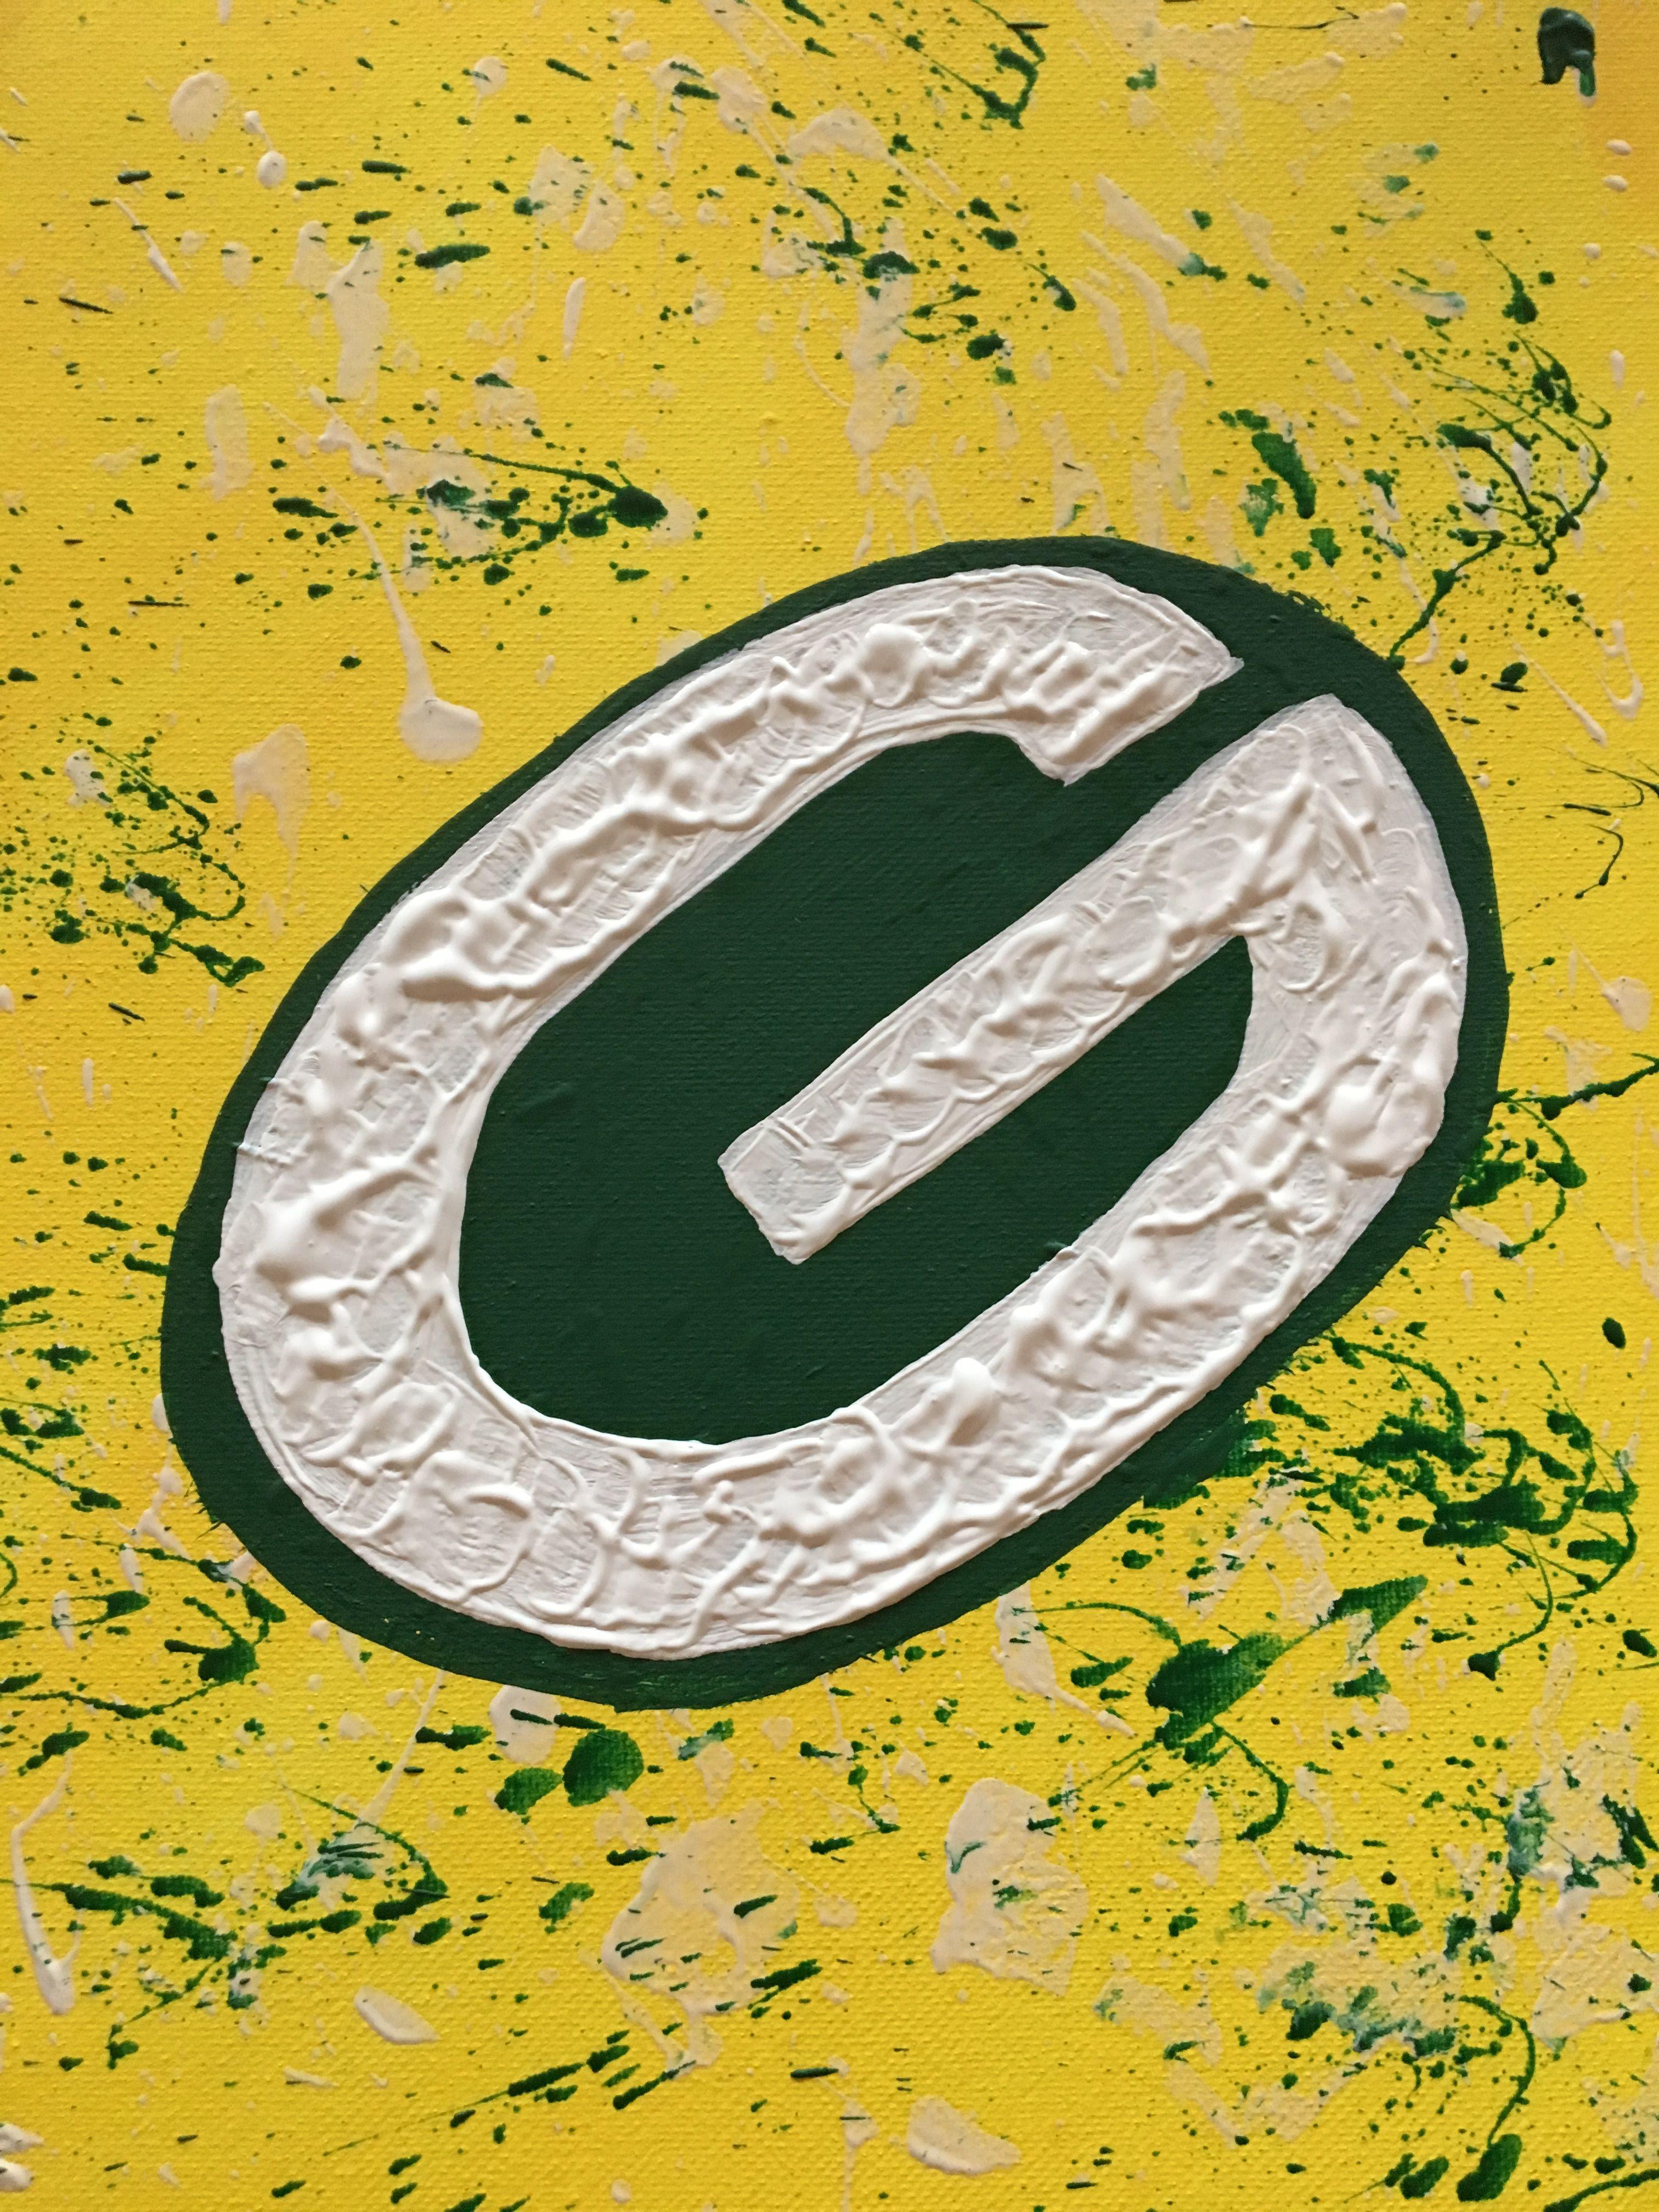 Green Bay Packers Logo Crayon Splatter Painting Green Bay Packers Logo Painting Paint Splatter